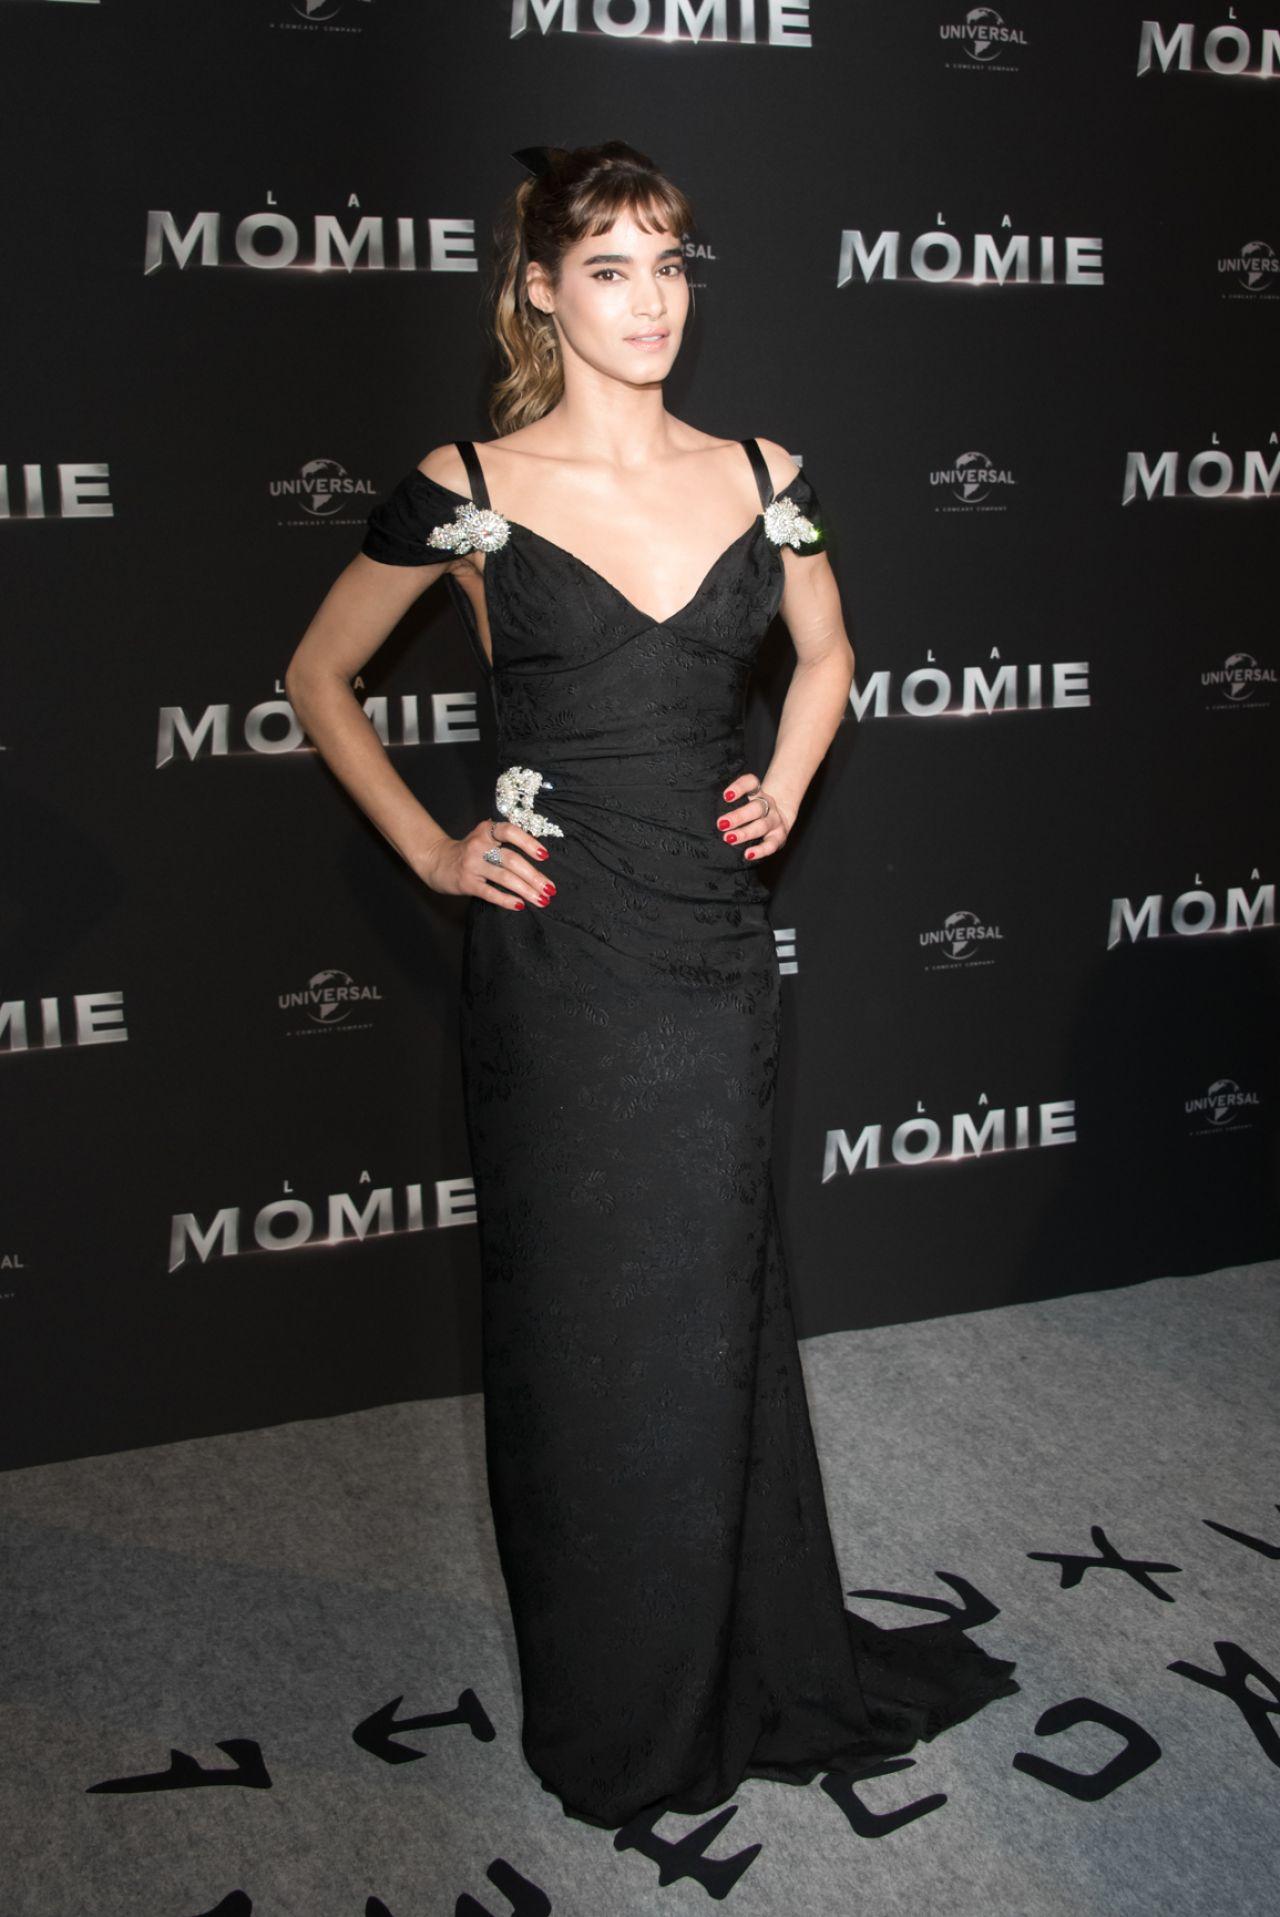 http://celebmafia.com/wp-content/uploads/2017/05/sofia-boutella-the-mummy-premiere-in-paris-france-05-30-2017-10.jpg